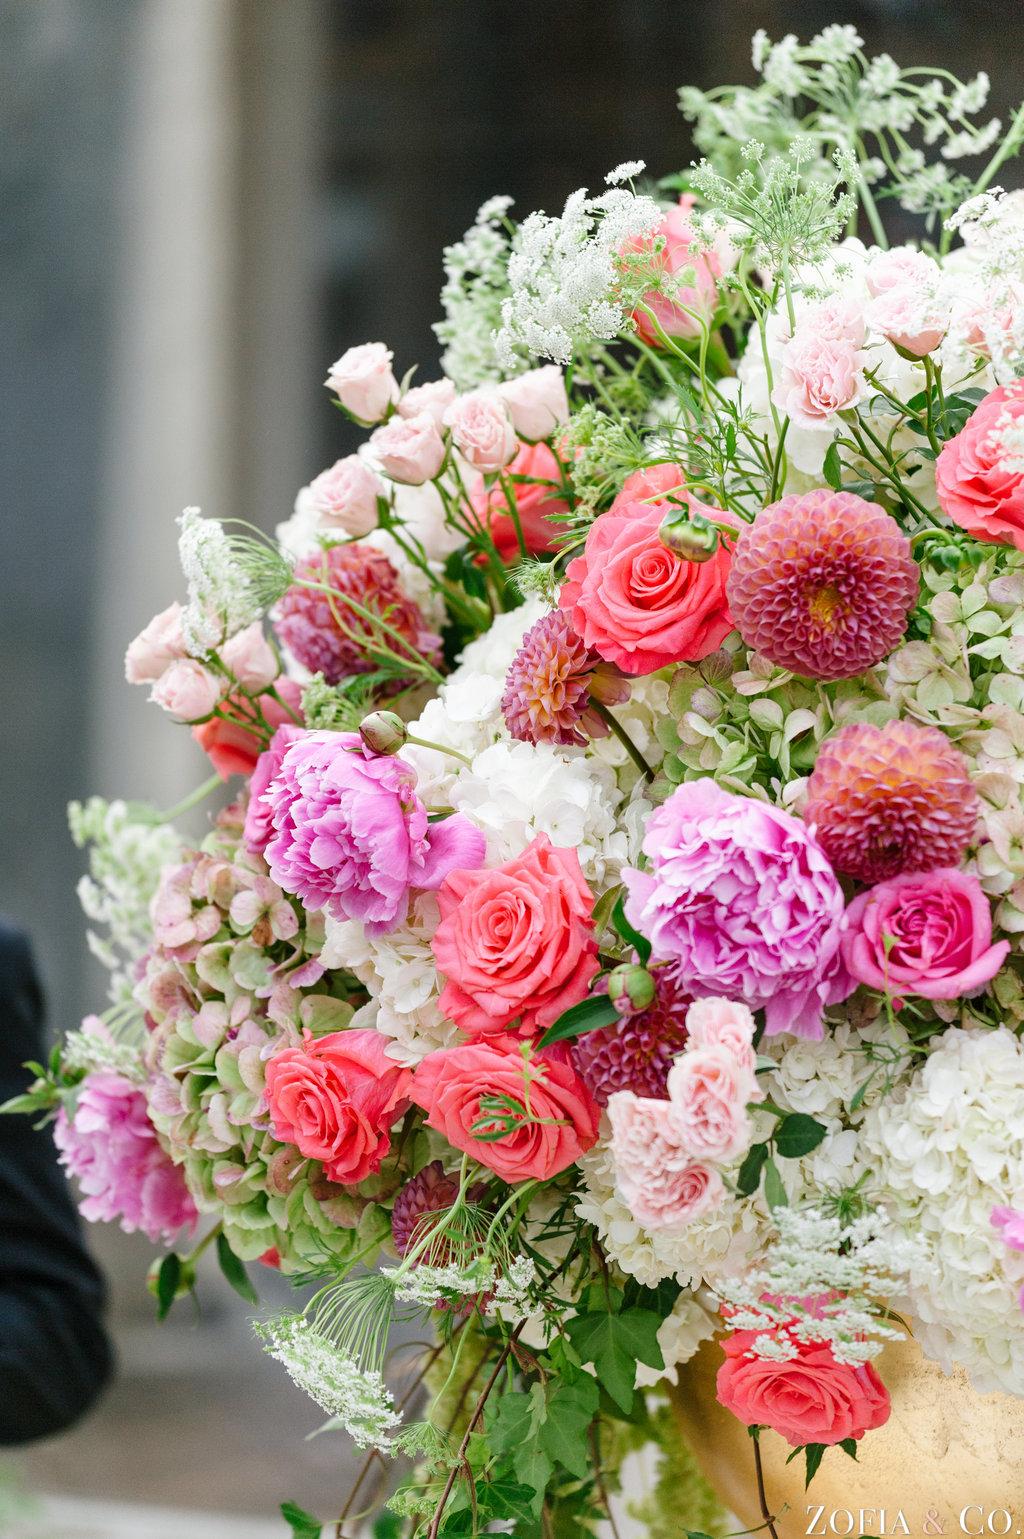 Ceci_New_York_Style_Luxury_Custom_Summer_Wedding_CeciBride_Nautical_Blue_Gold_Letterpress_Foil_212.jpg